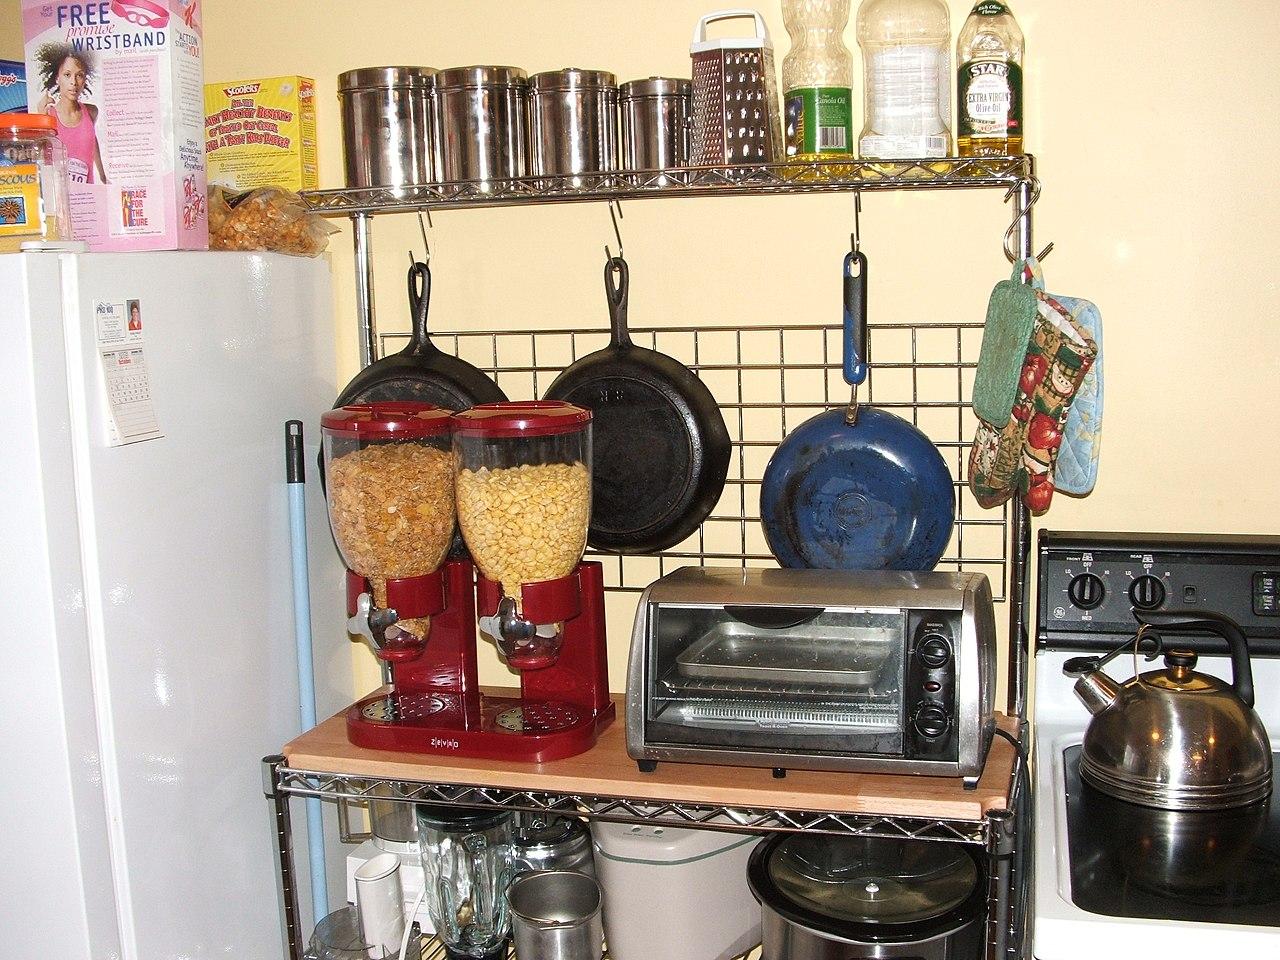 File:Bakers rack (108932697).jpg - Wikimedia Commons